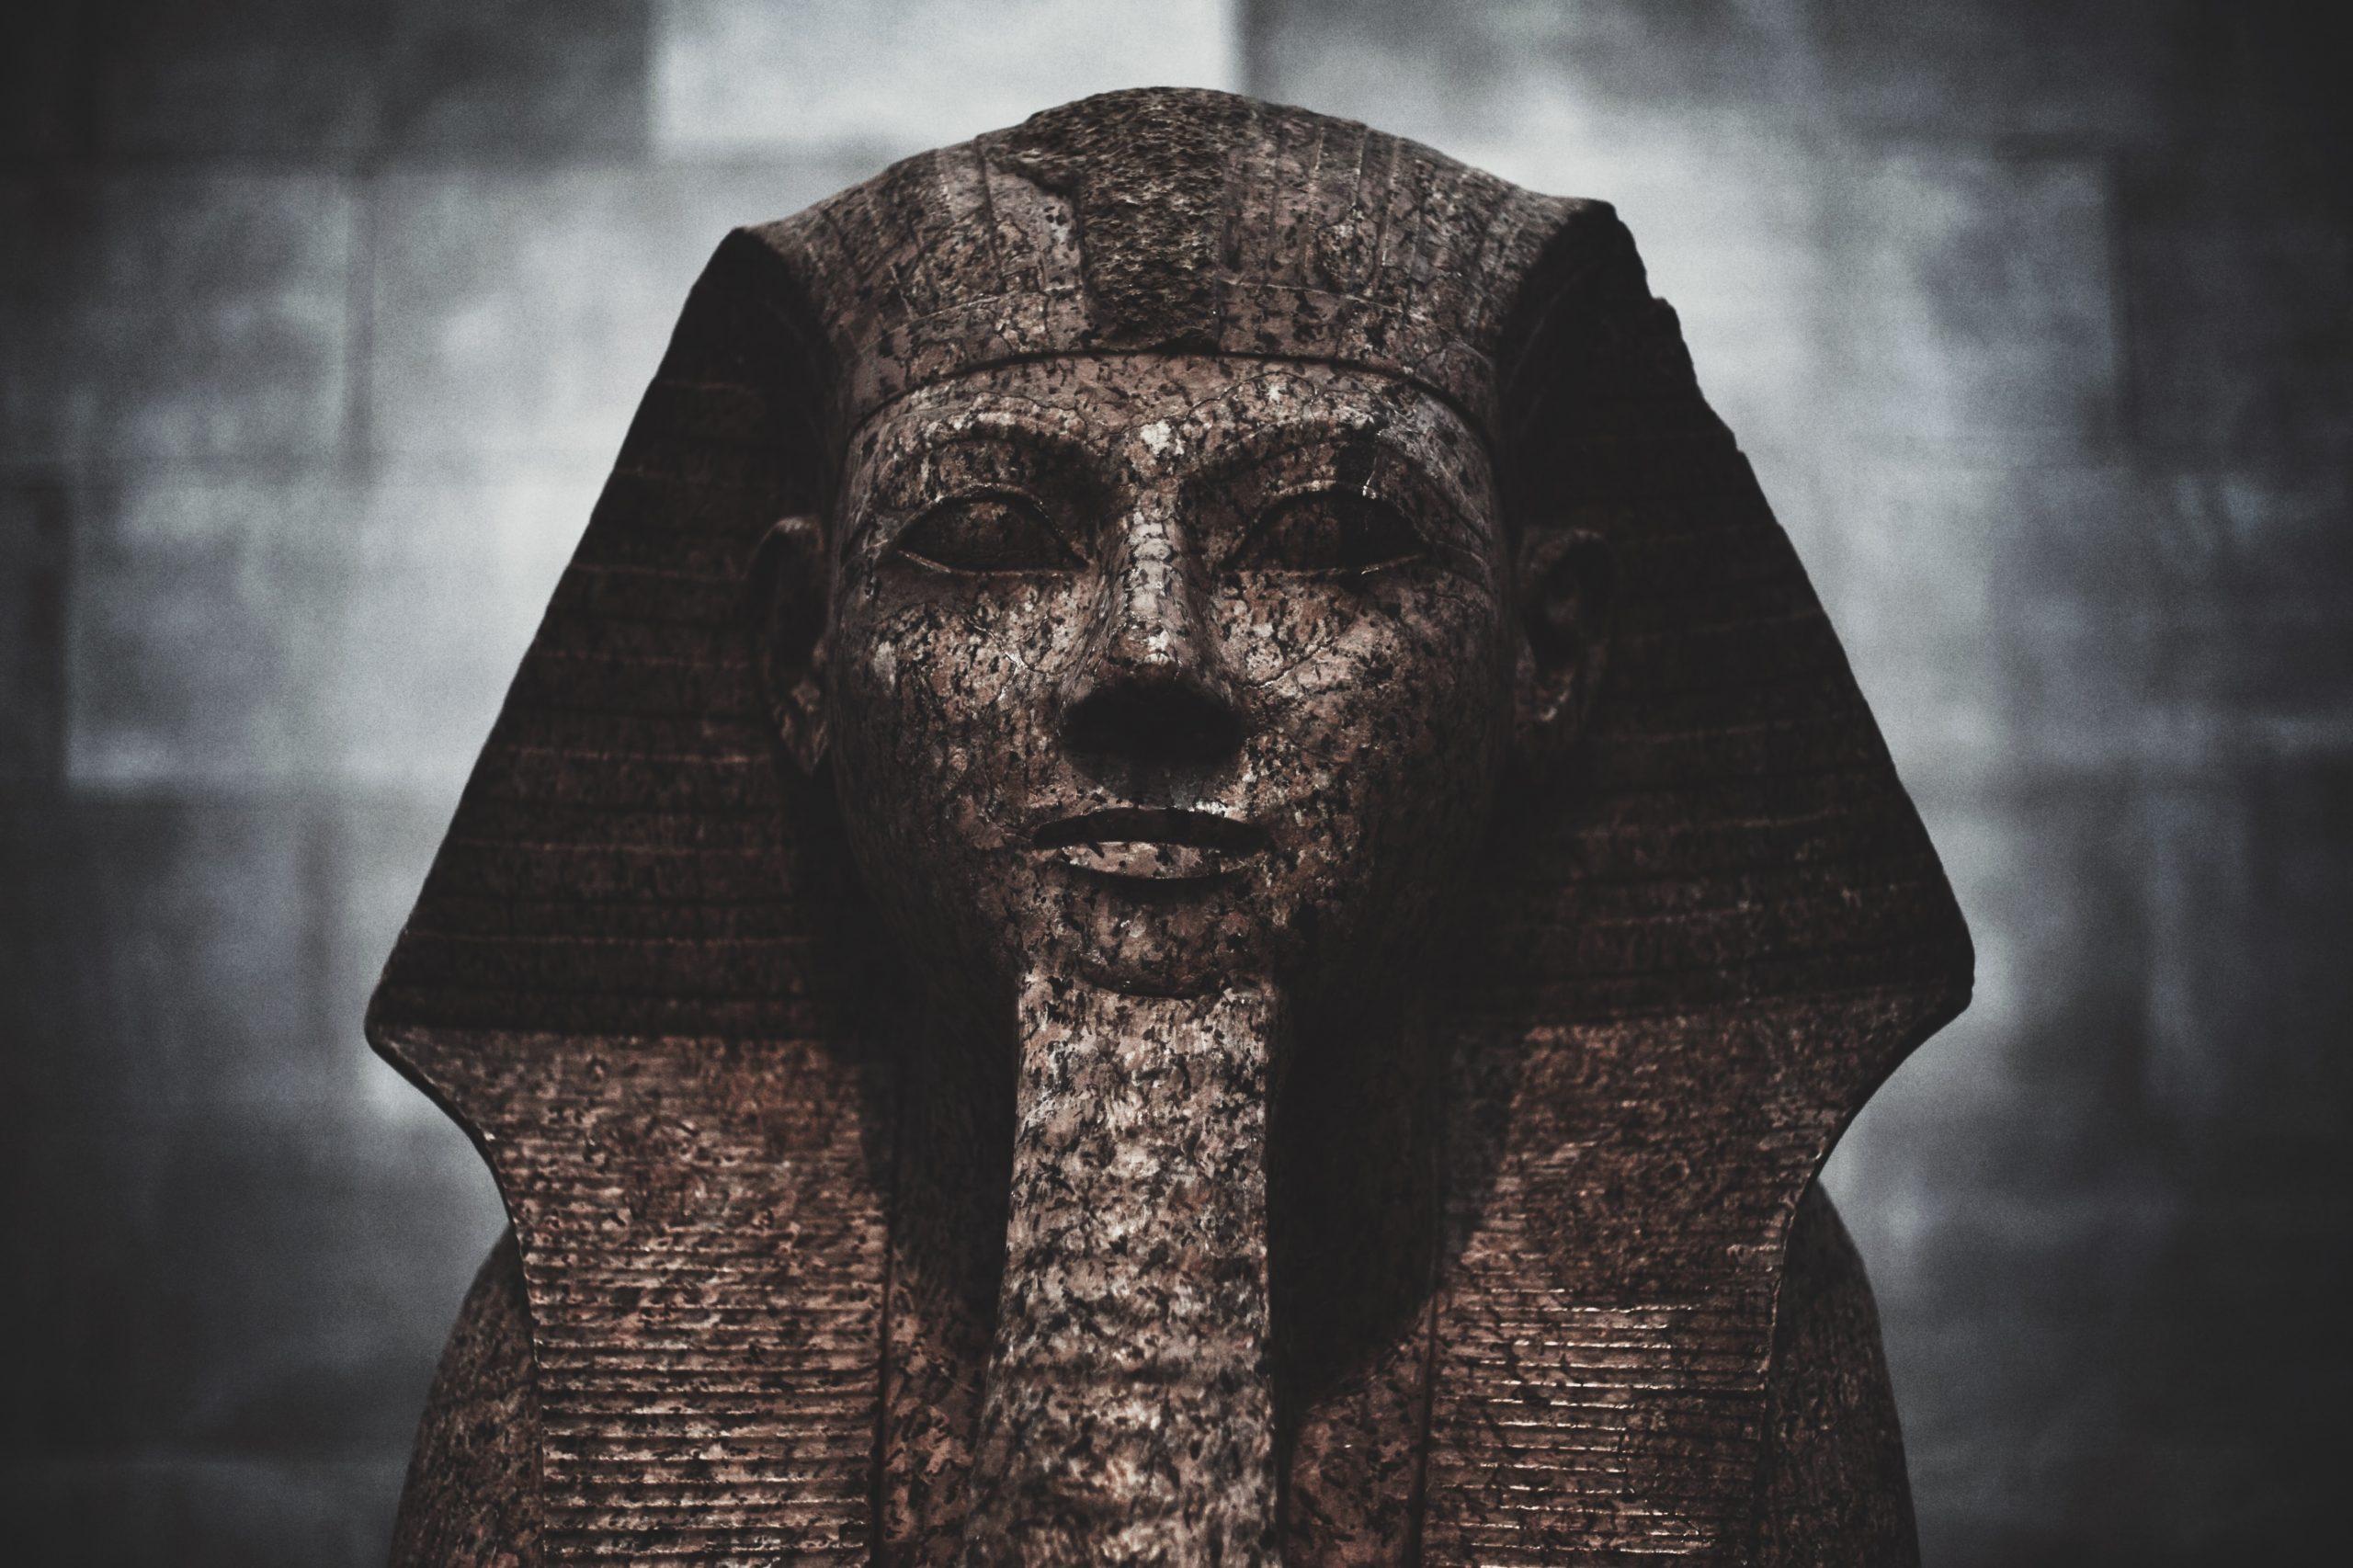 sarkofag, egypten (Foto: Unsplash)